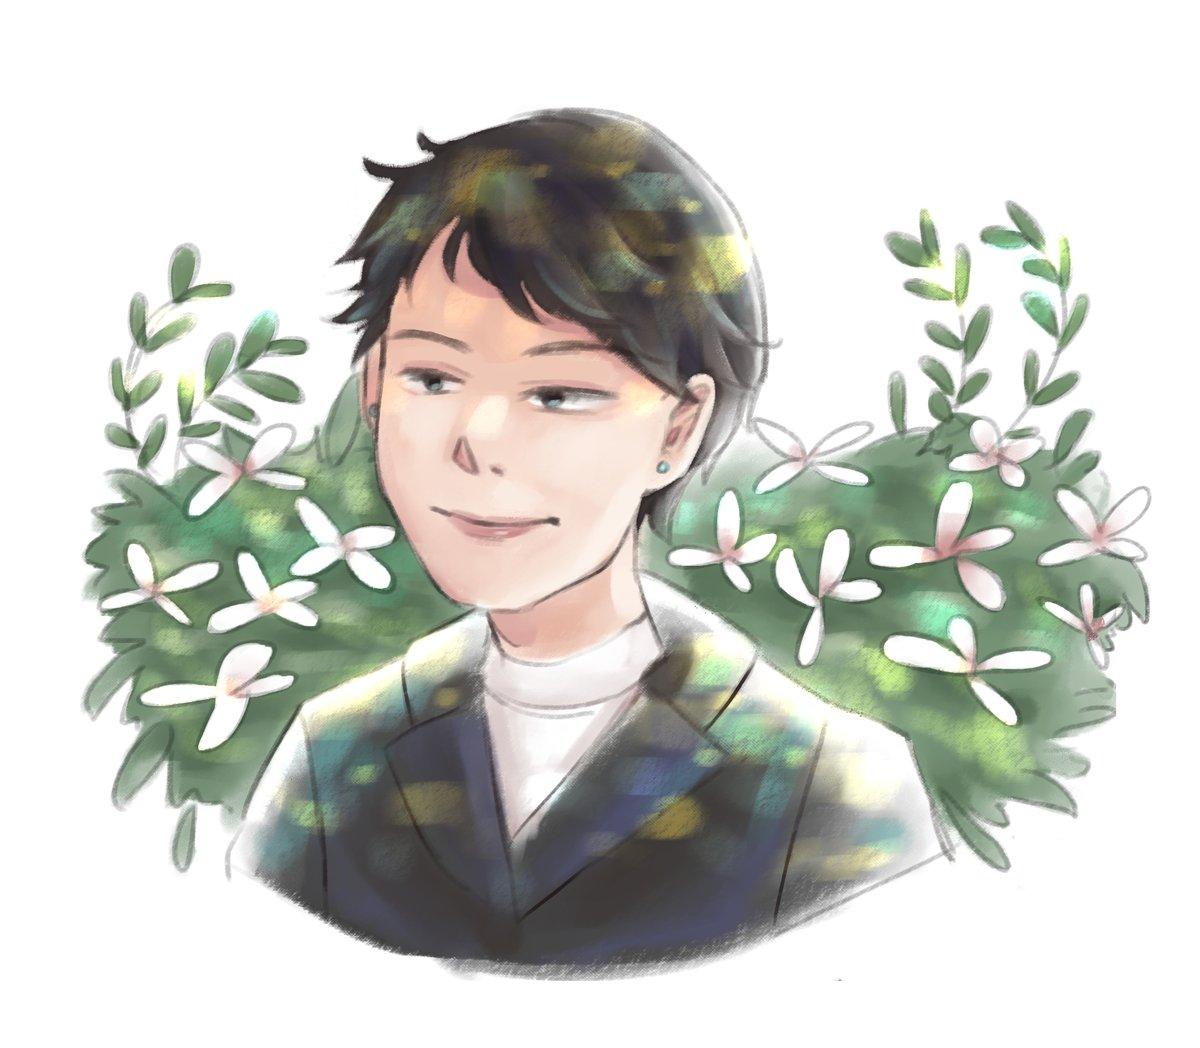 RT @BreadLvr69: Doodle  #disguisedtoast #disguisedtoastfanart https://t.co/bgkhqhvhhX